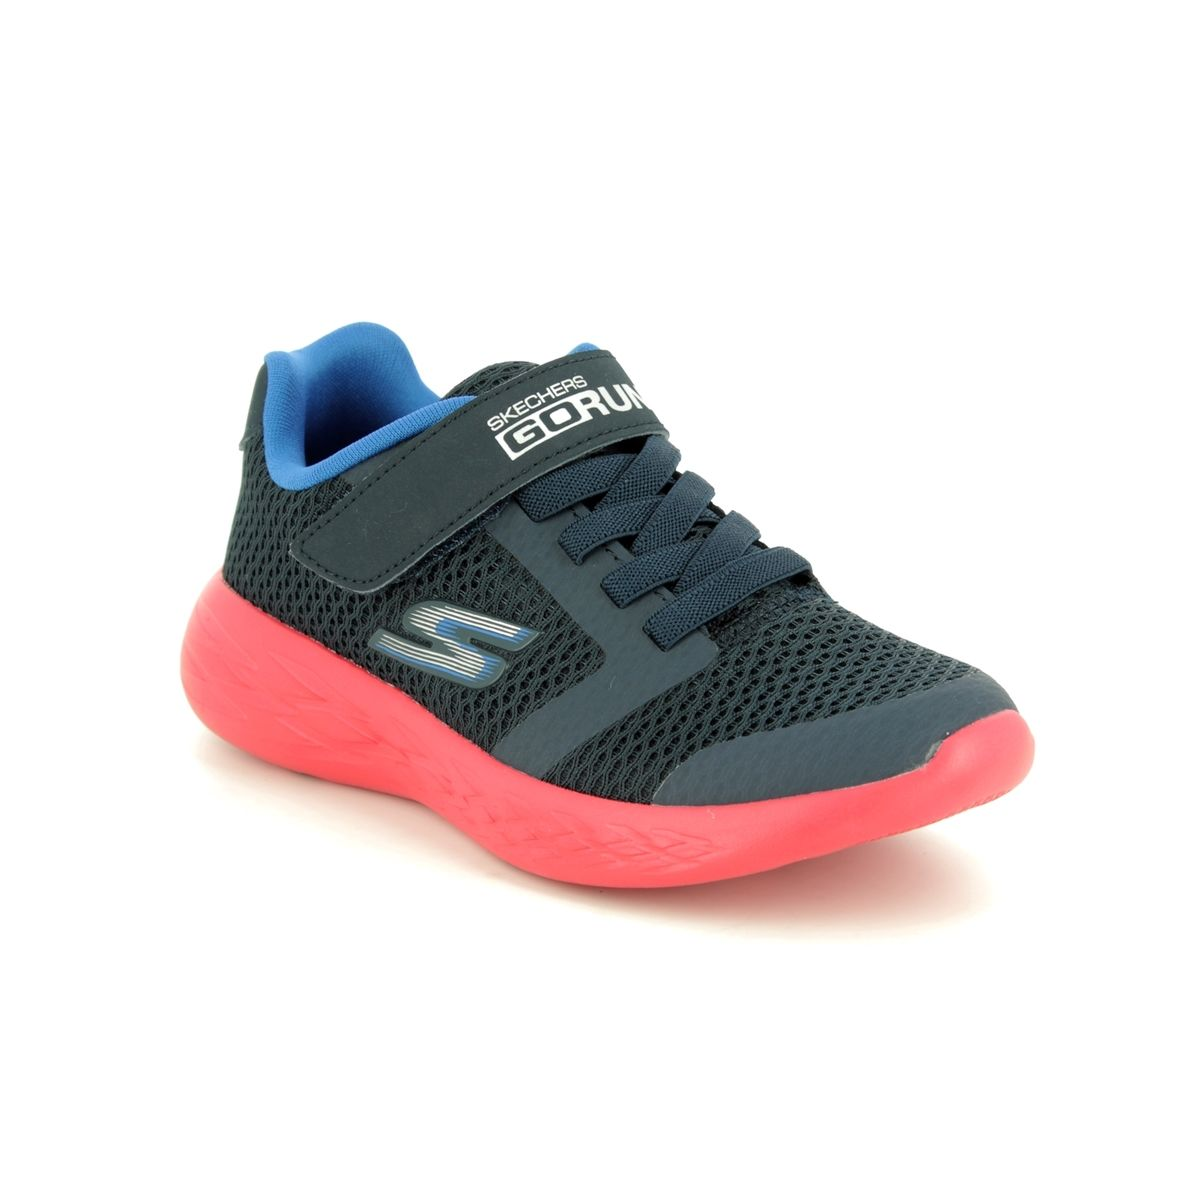 Skechers Go Run 600 Roxlo Boys Black Trainer